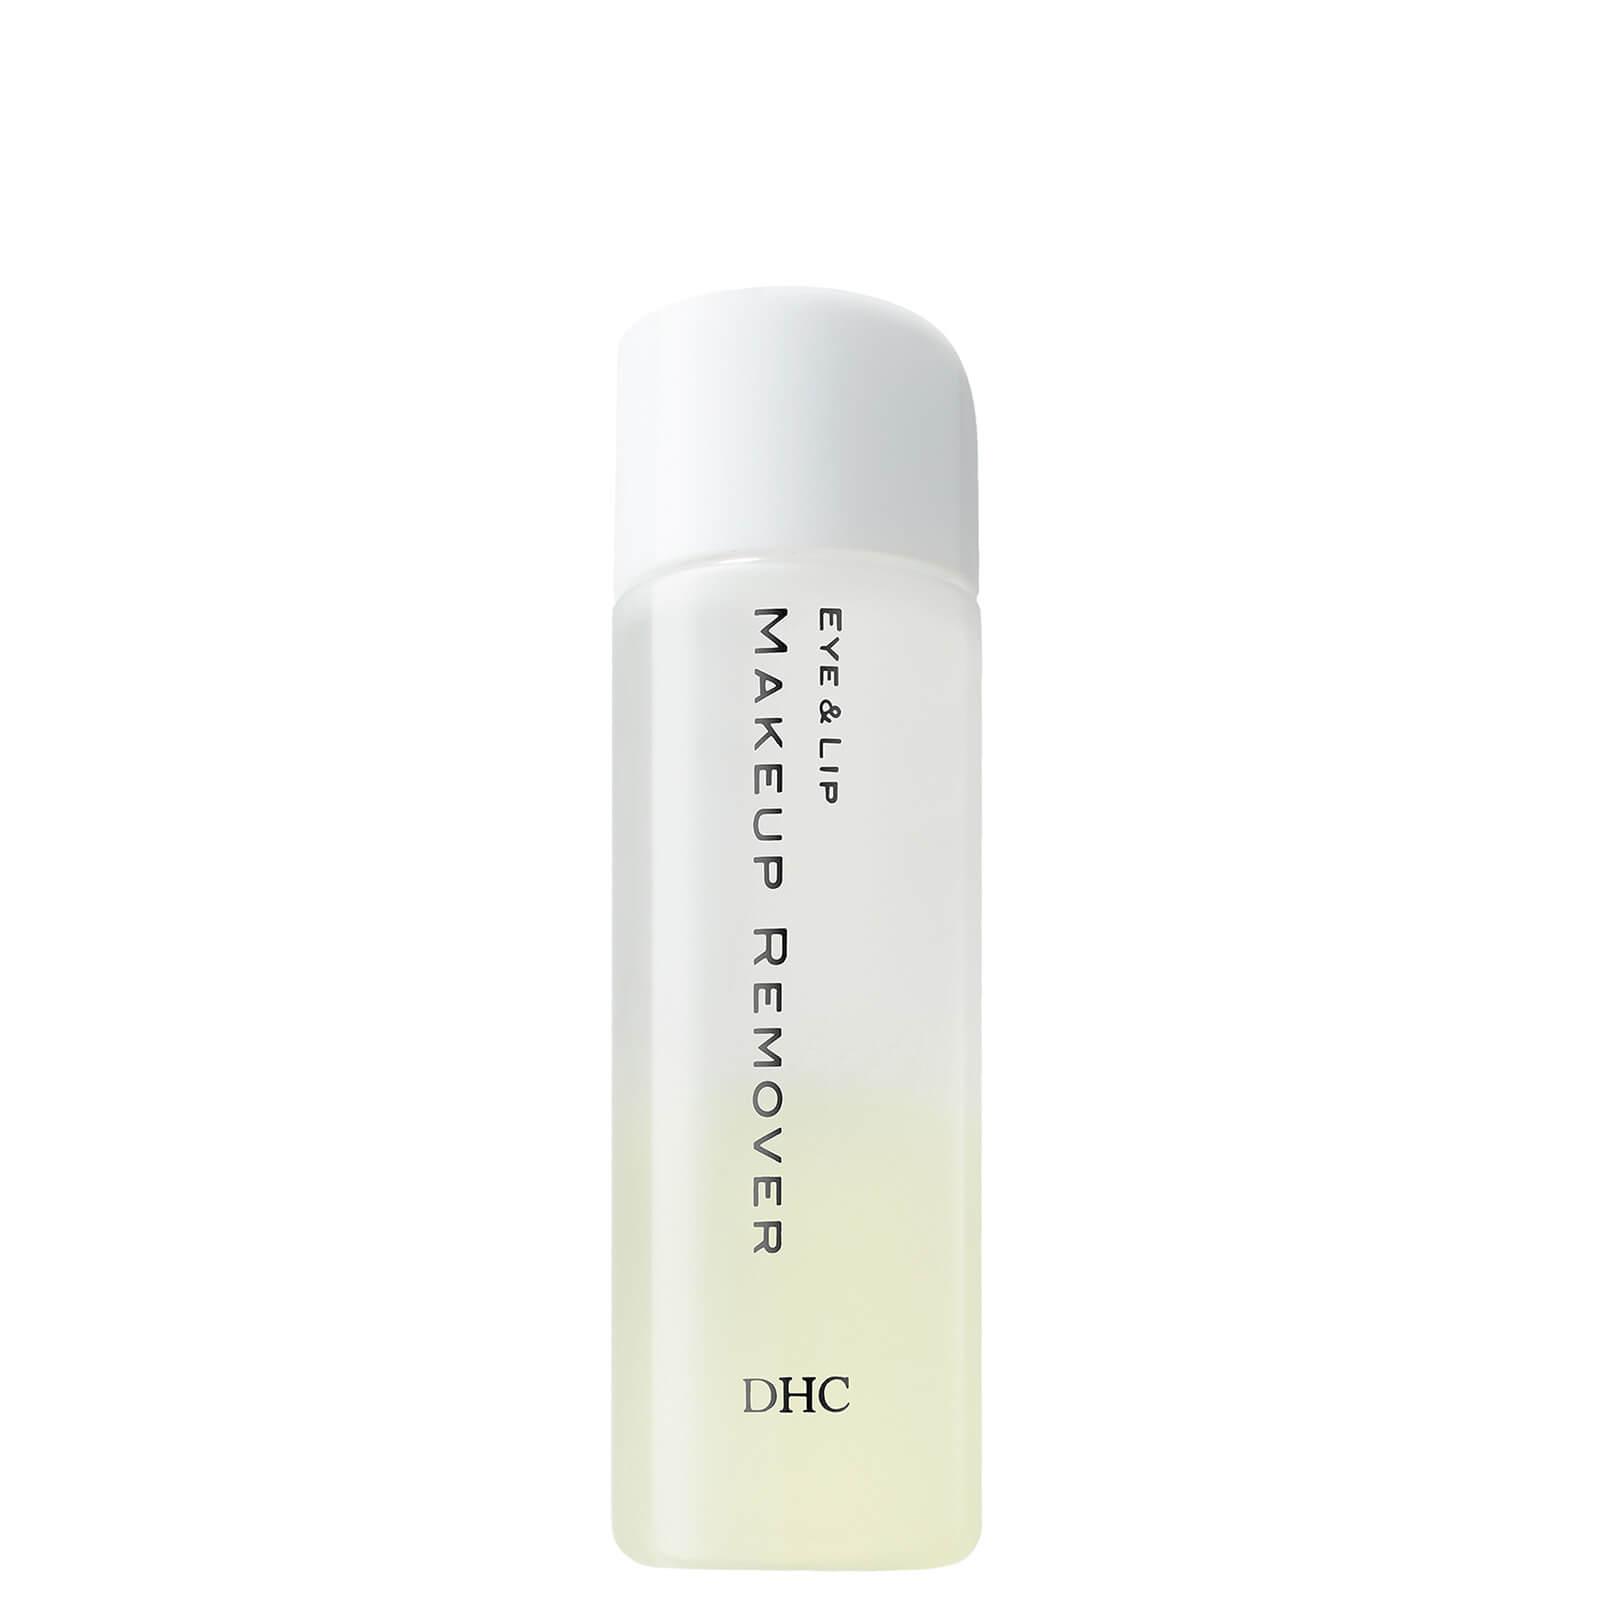 Купить Средство для снятия макияжа с глаз и губ DHC Eye and Lip Make-Up Remover (120 мл)